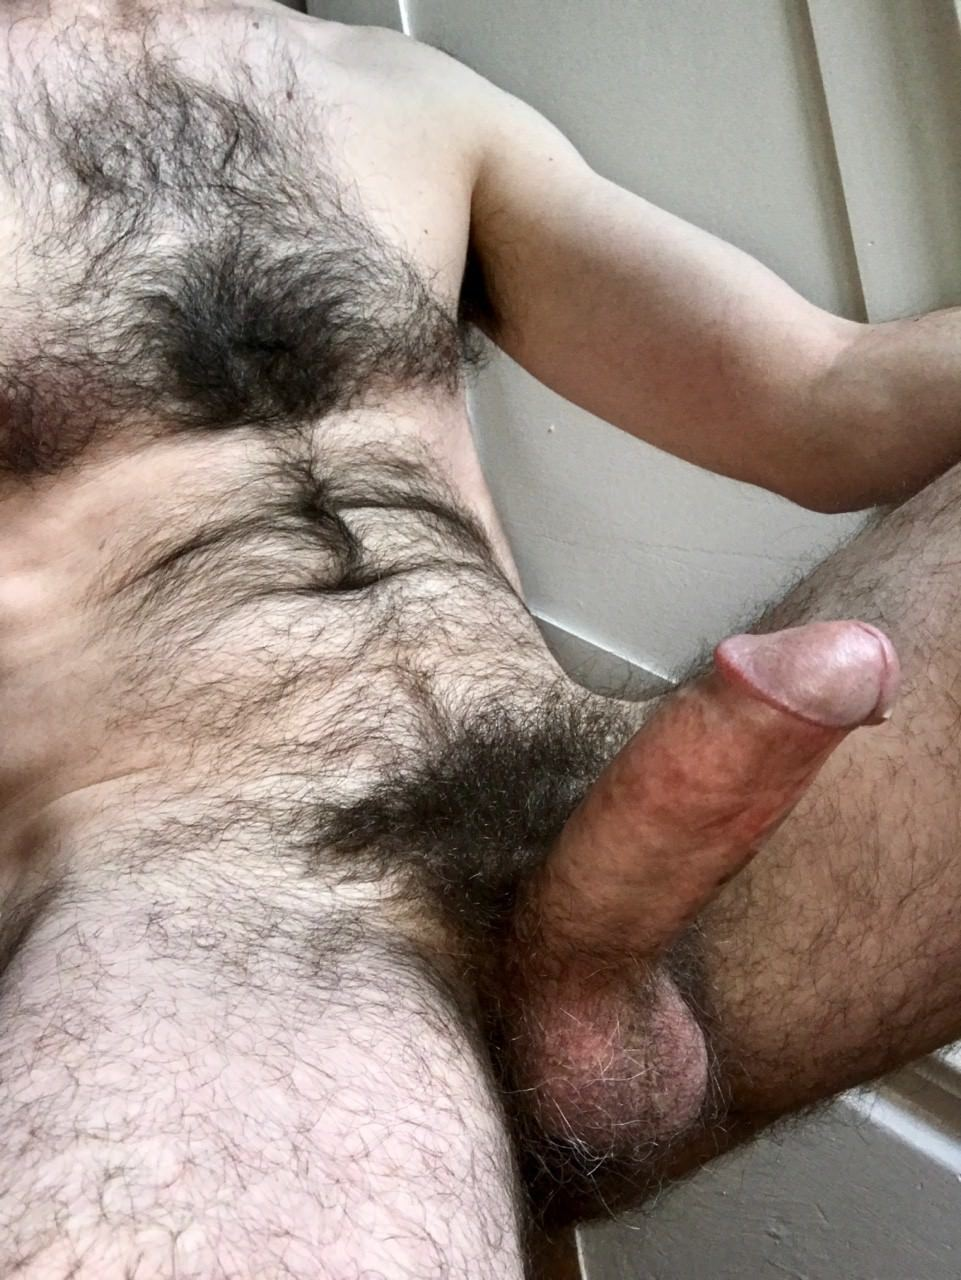 Ball gay hairy